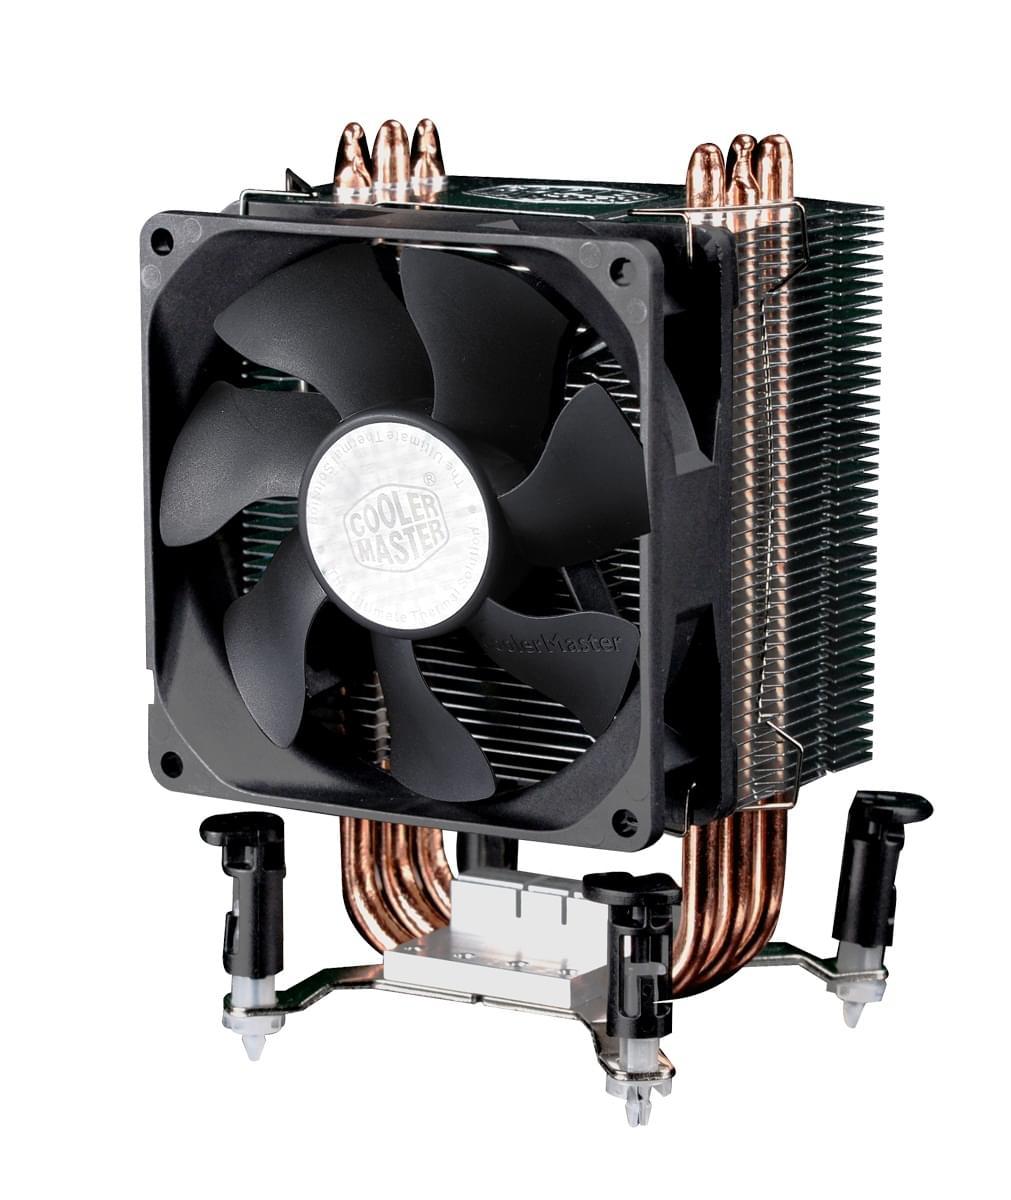 Cooler Master Hyper TX3 Evo RR-TX3E-22PK-R1 (RR-TX3E-22PK-R1) - Achat / Vente Ventilateur sur Cybertek.fr - 0